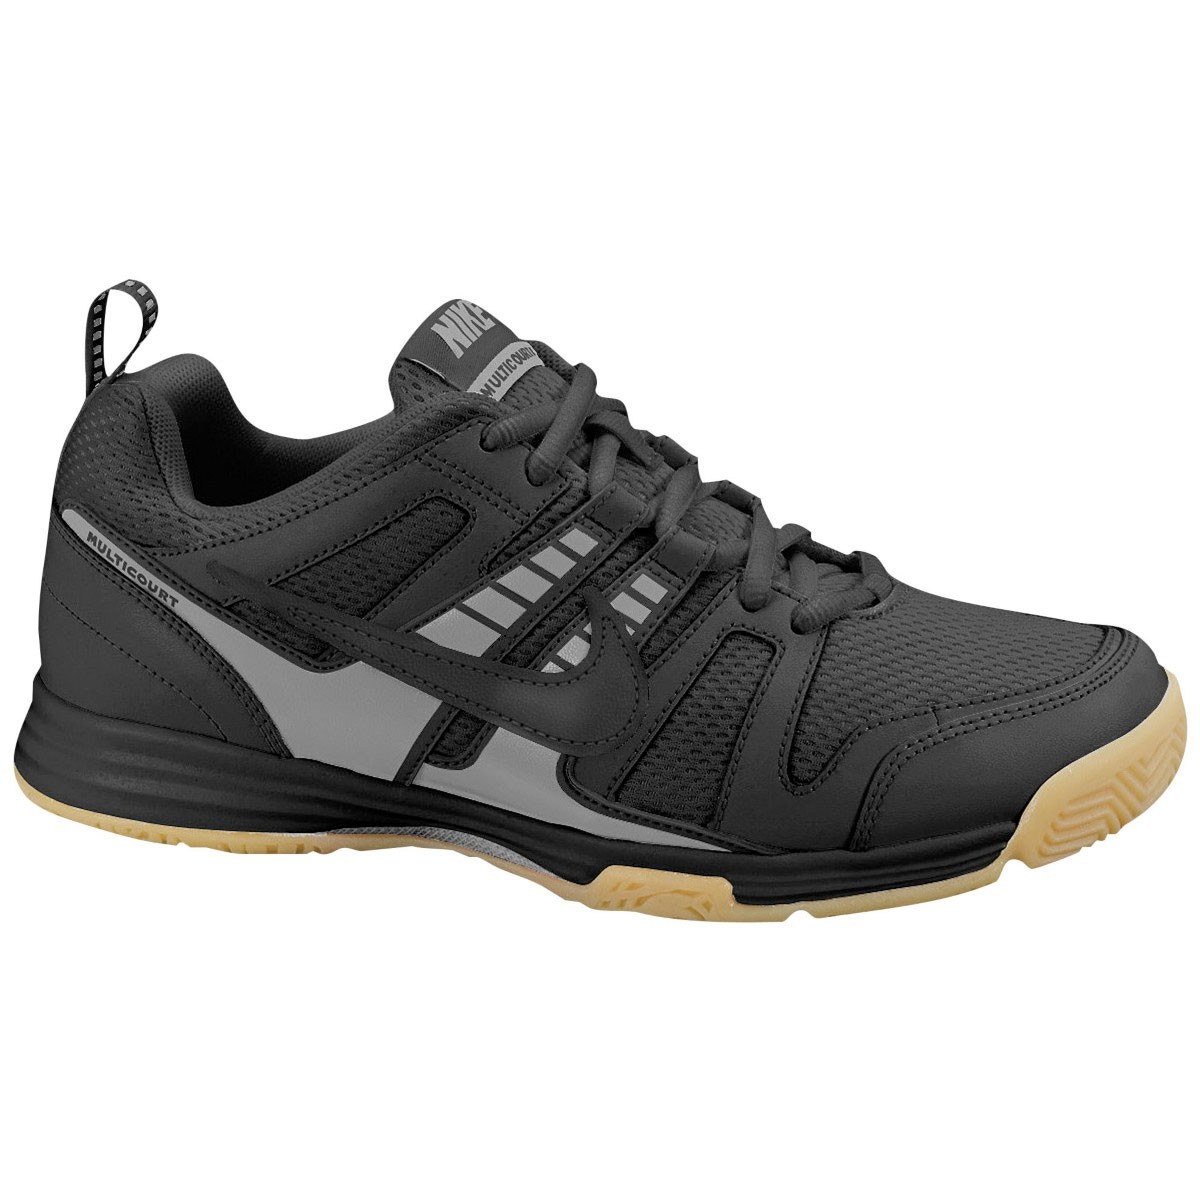 Nike Mens Multicourt Shoes